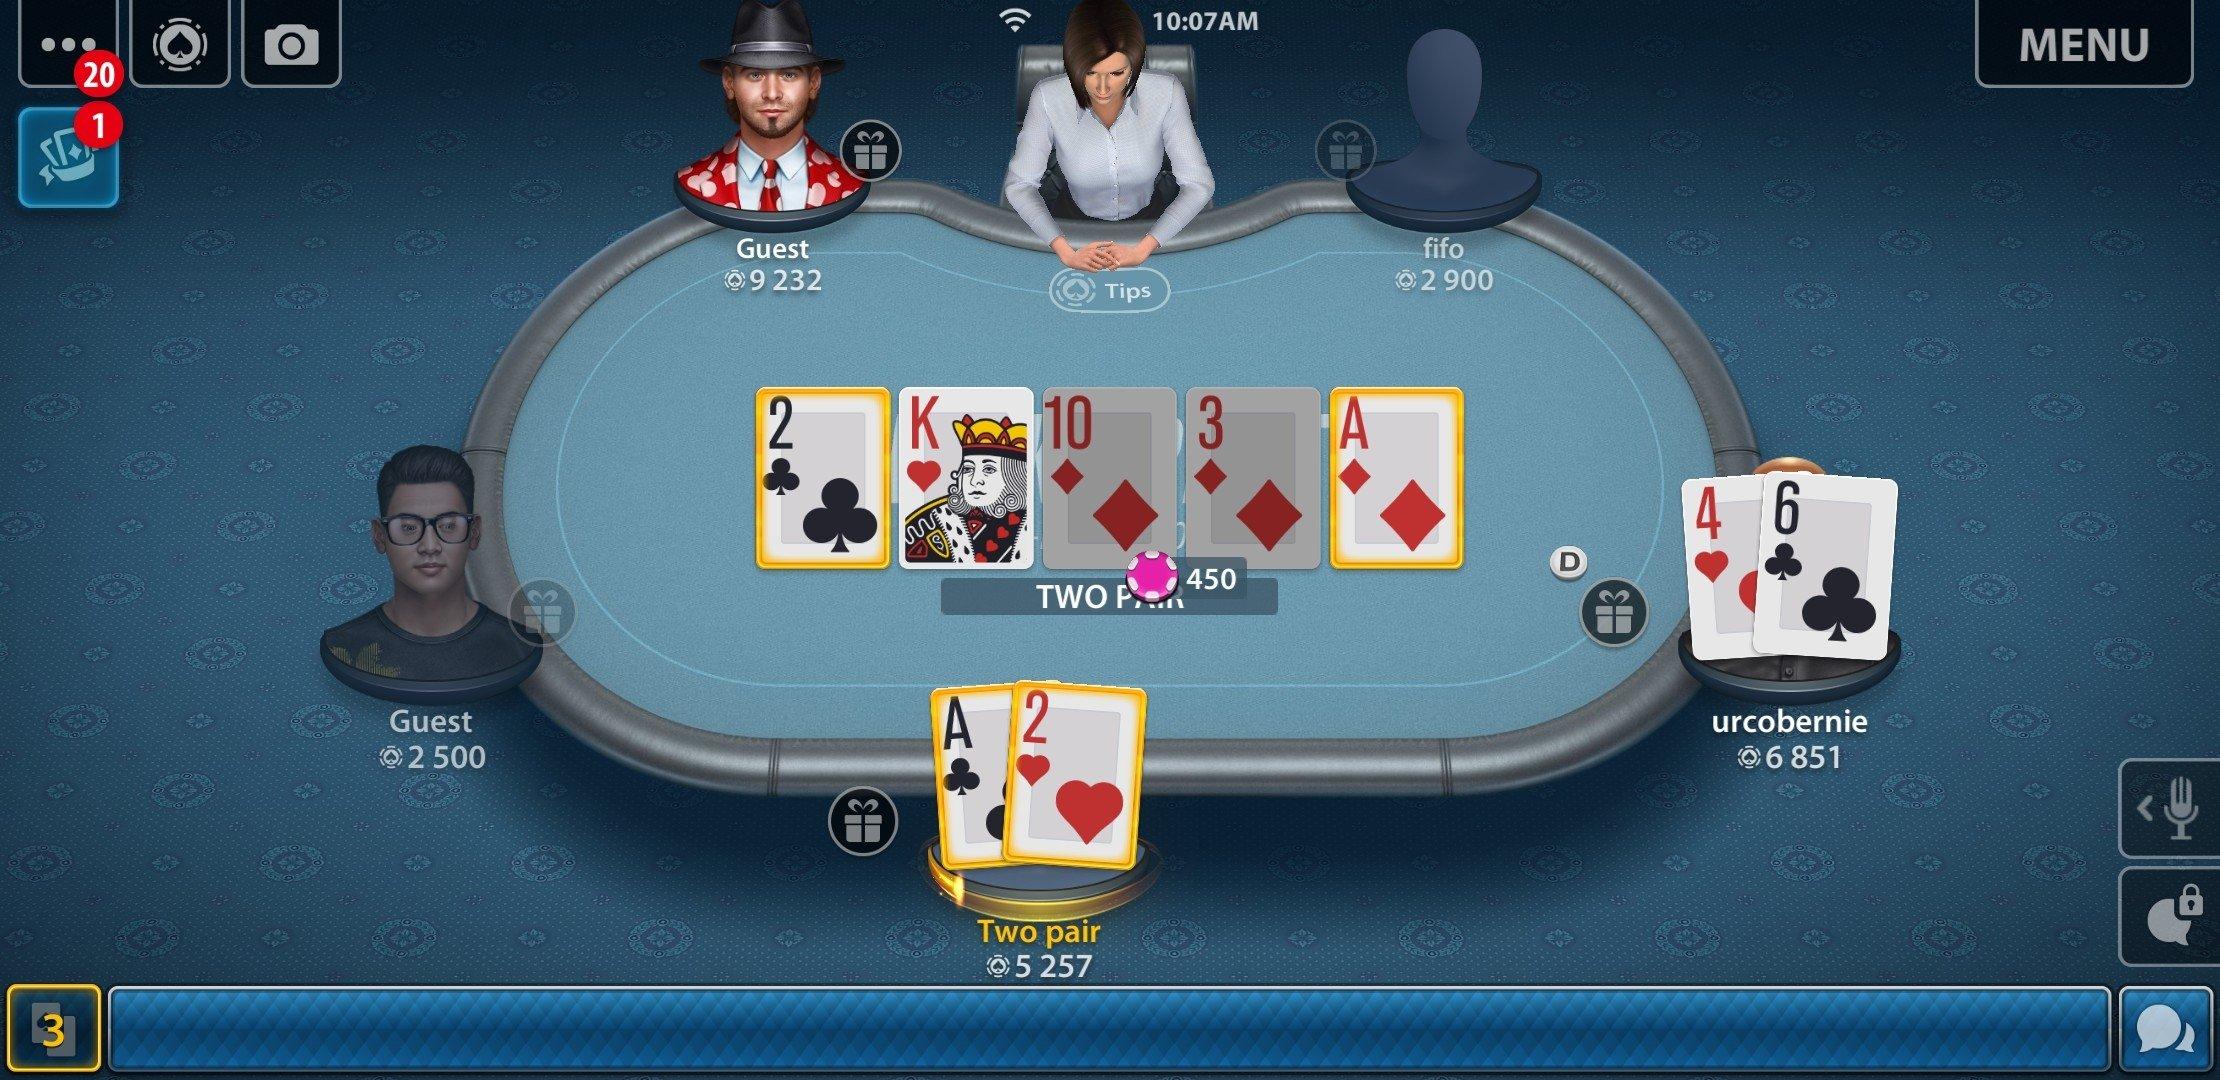 Pokerist Android image 4